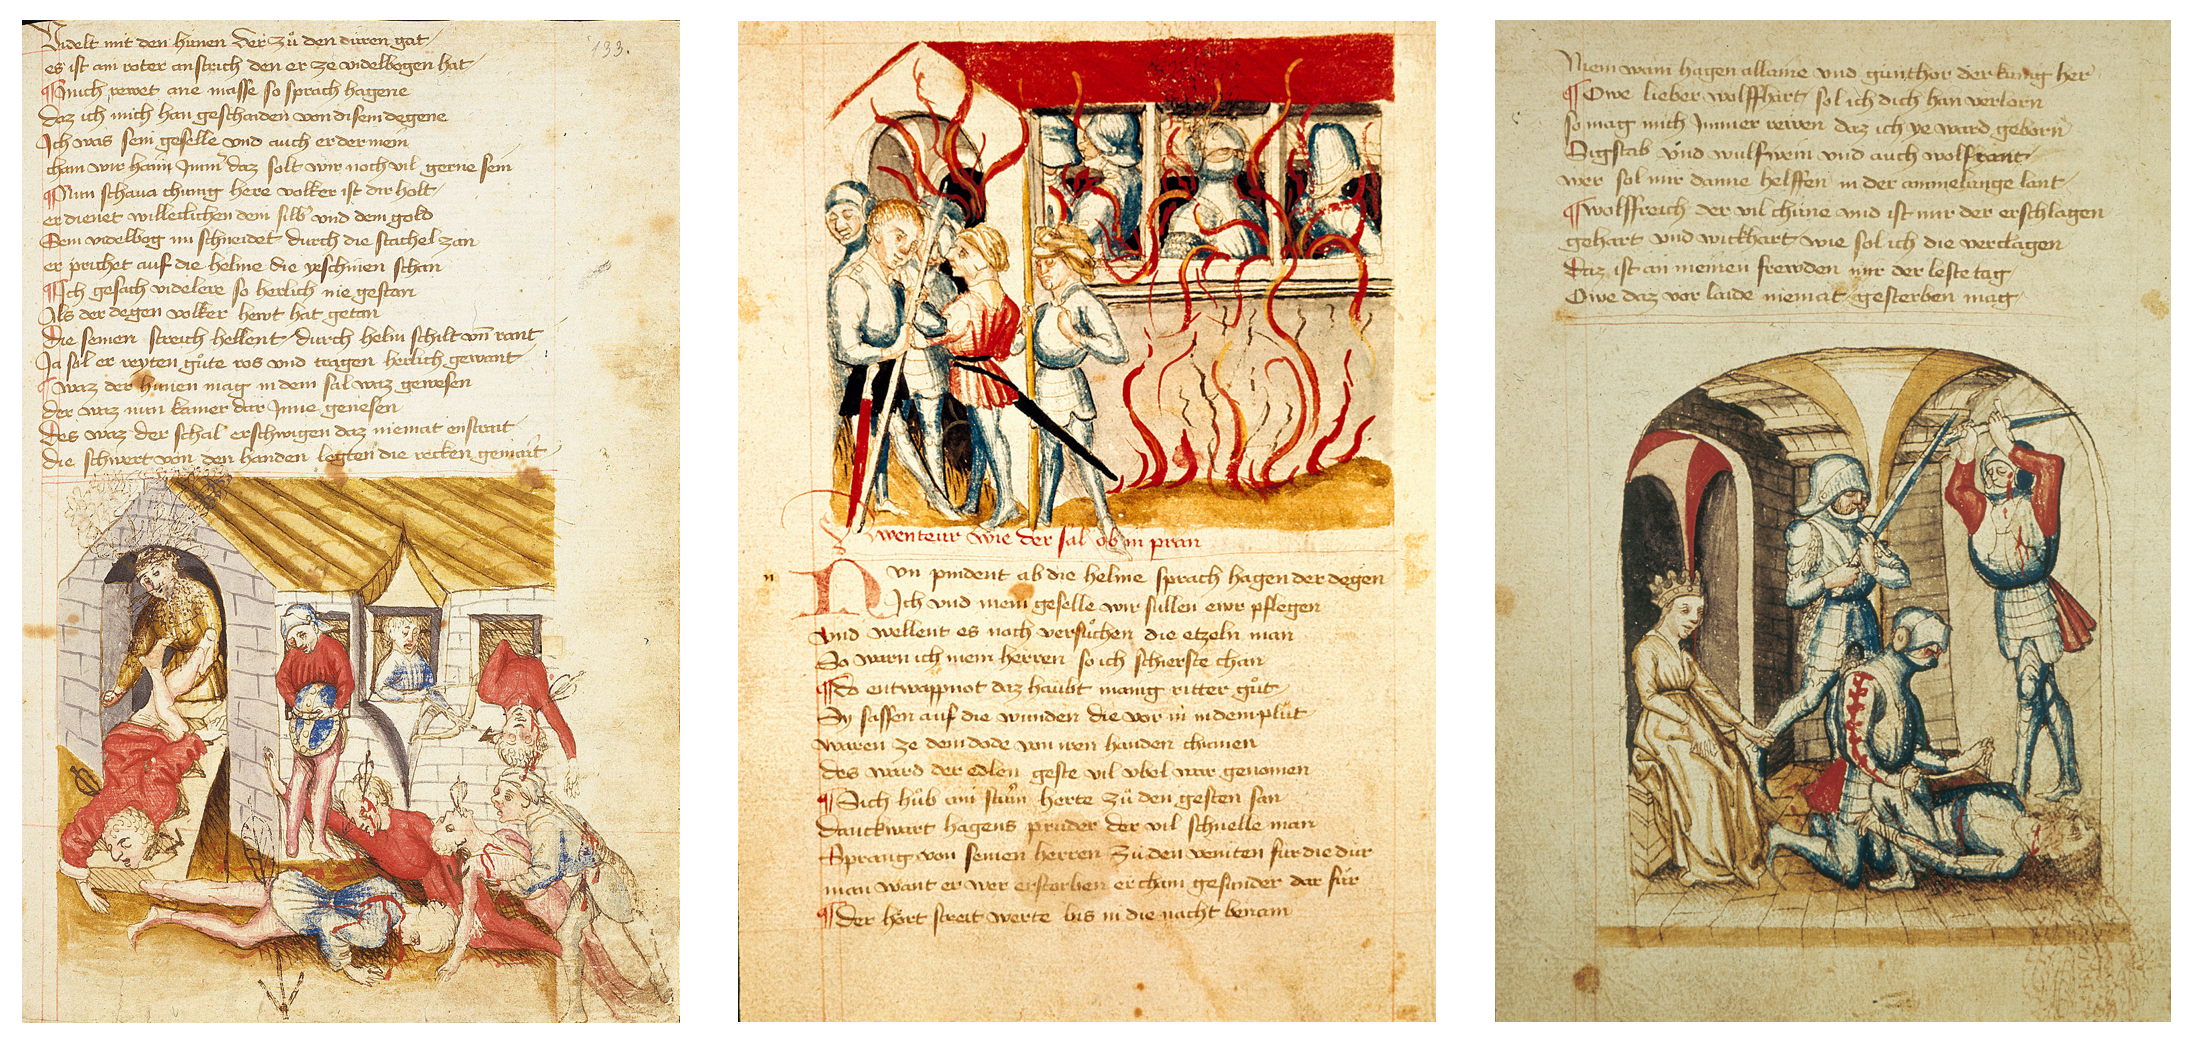 hundeshagen-codex-3.png